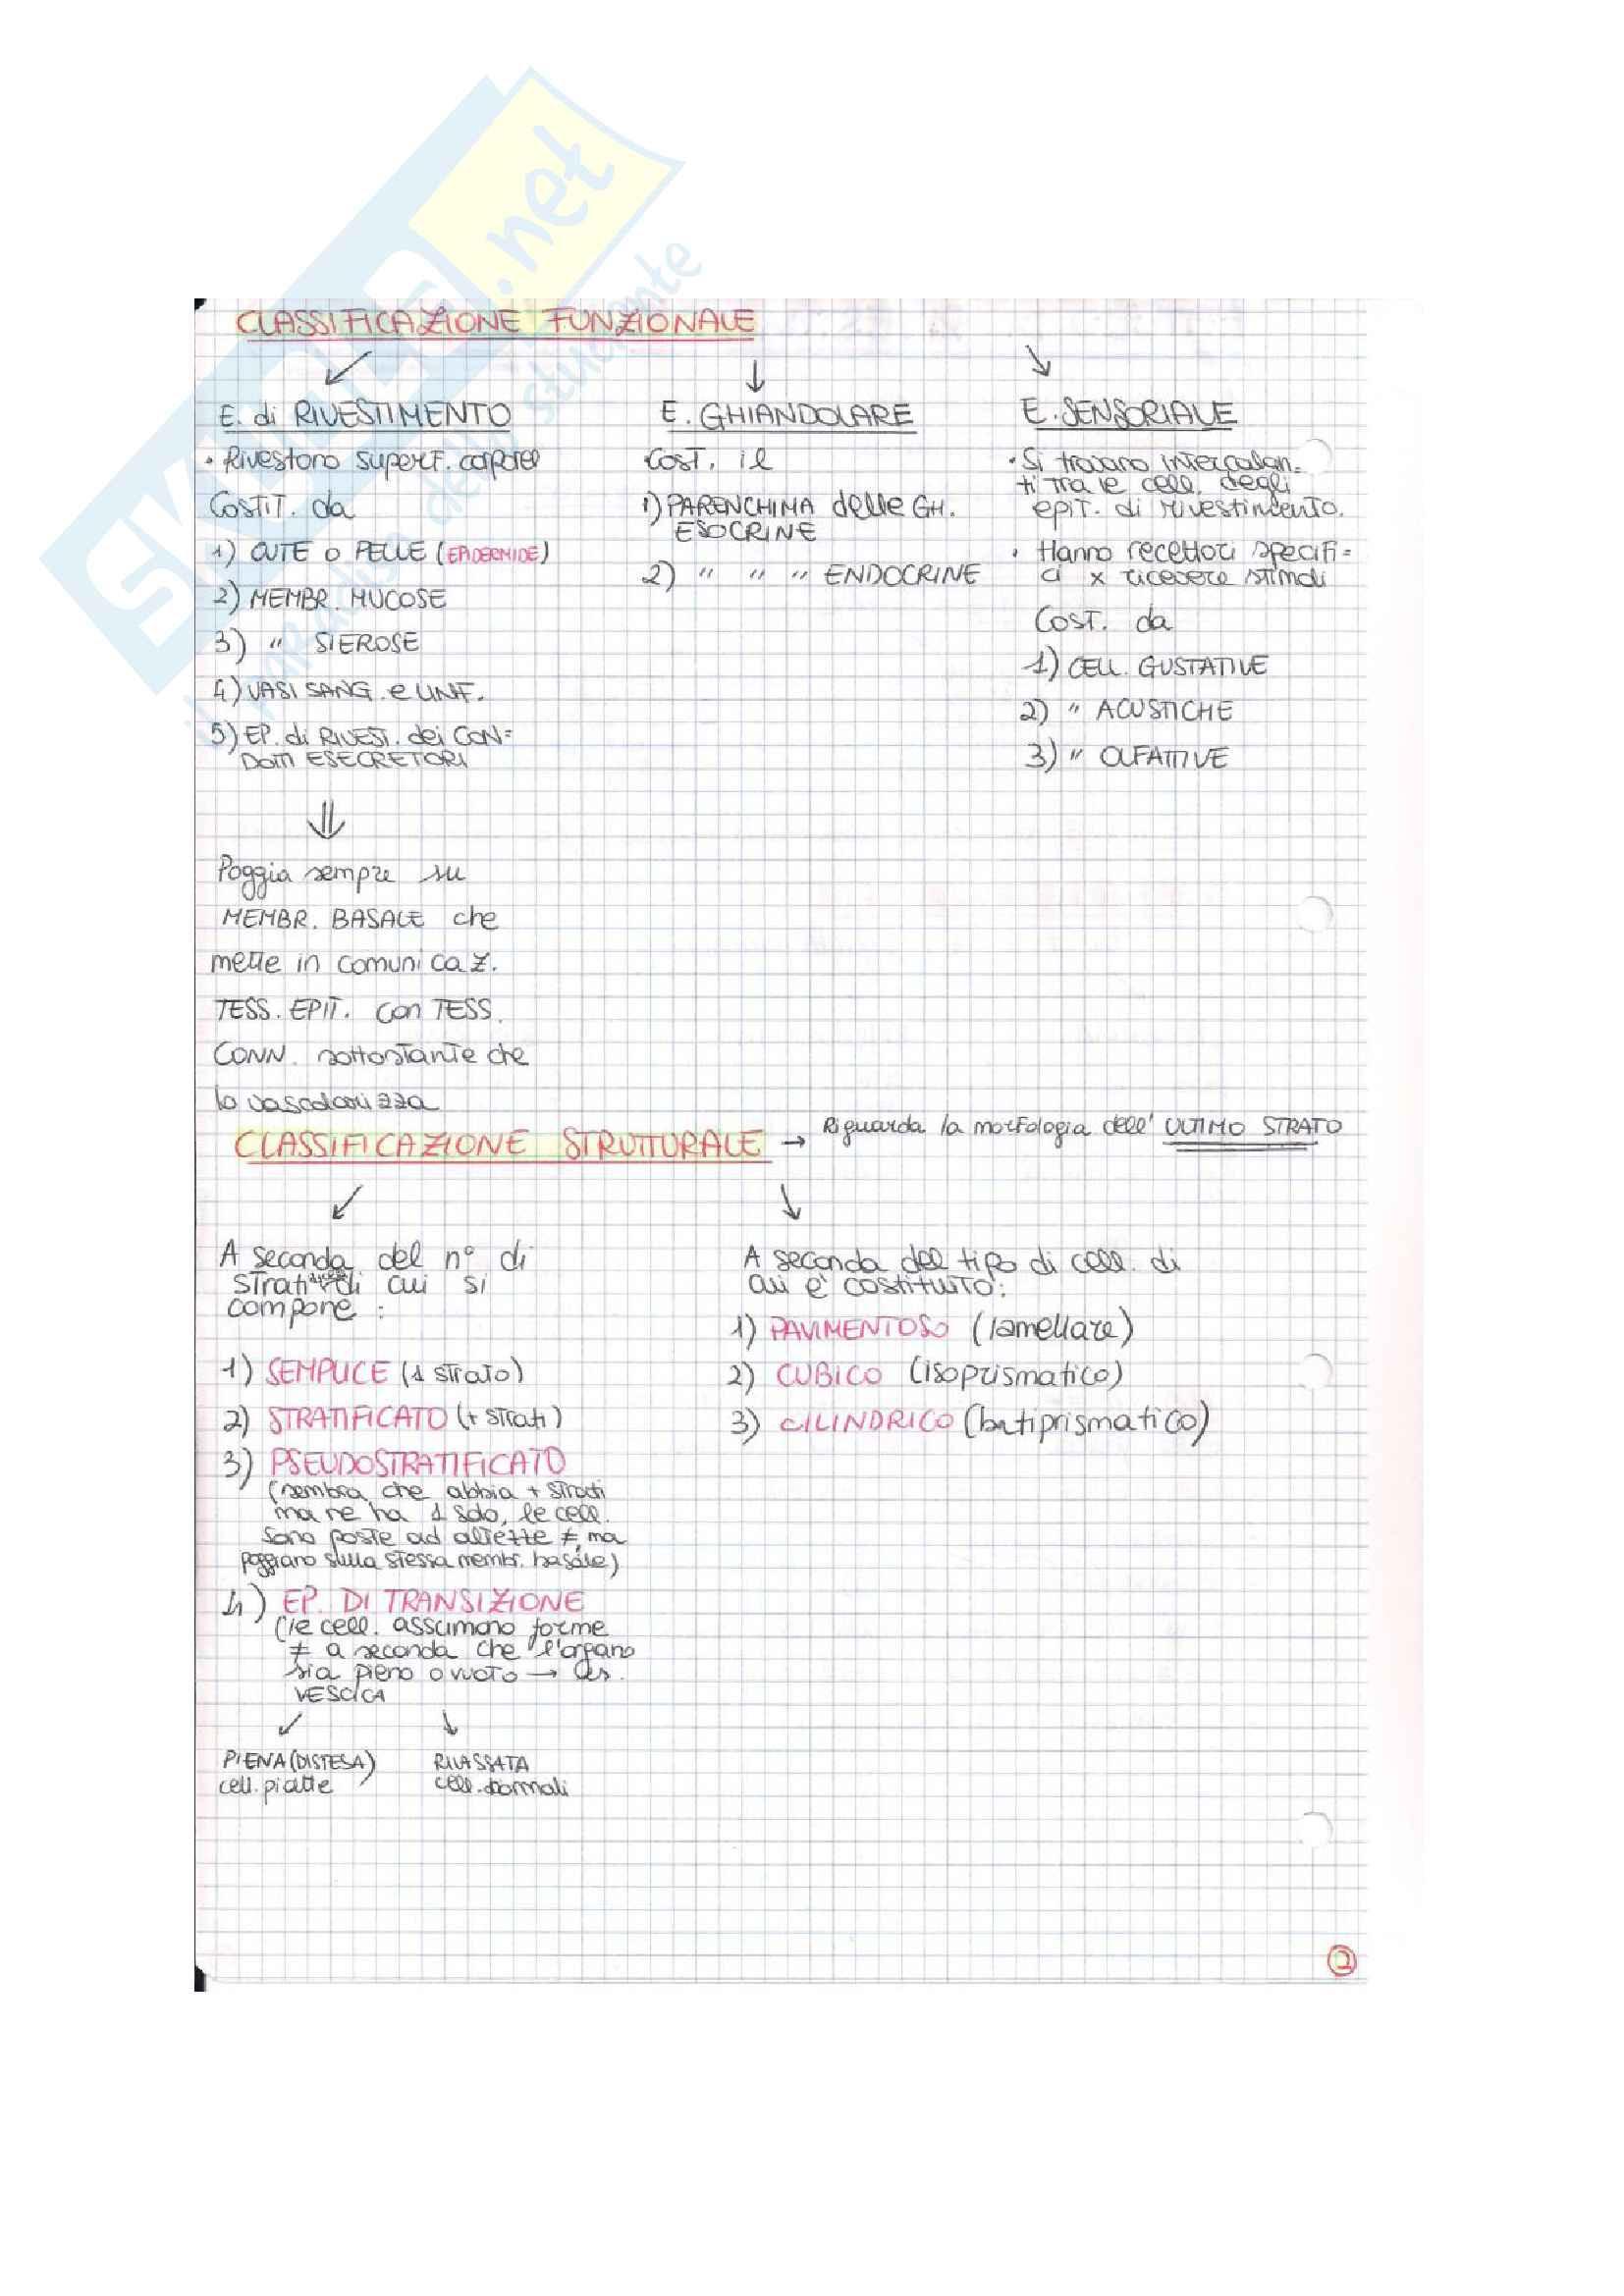 Istologia (esame istologia ed embriologia) Pag. 2